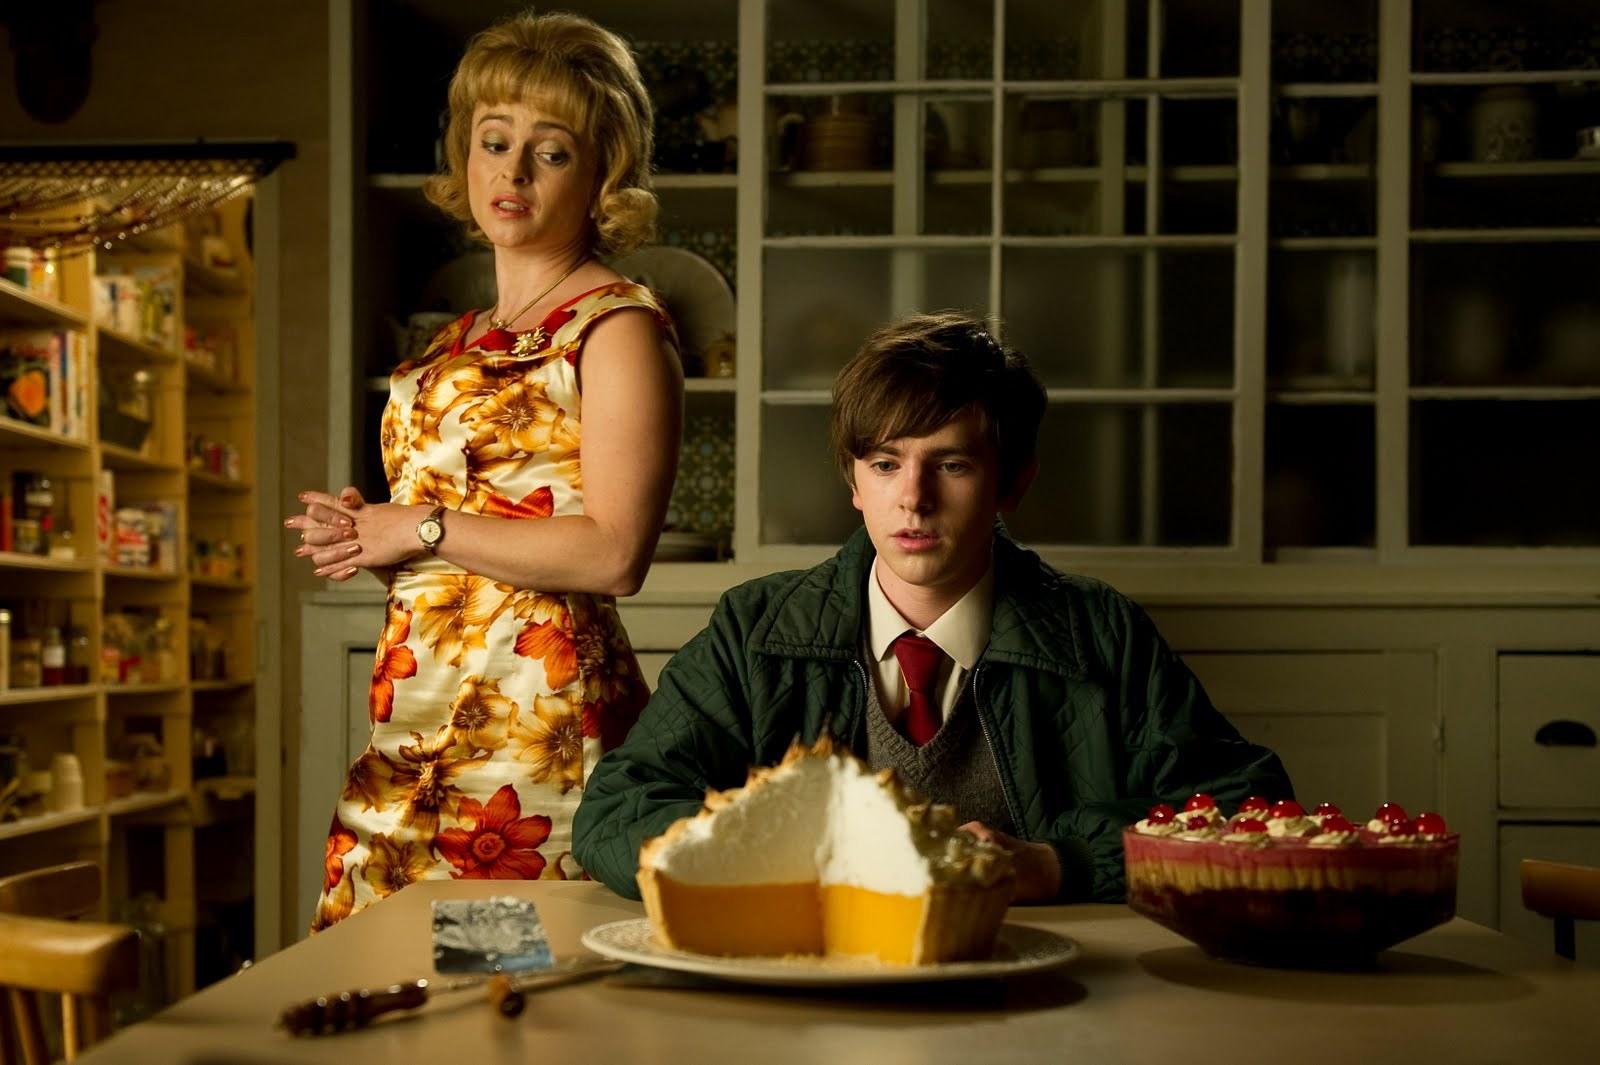 Sophie brickman dave eisenberg wedding cakes